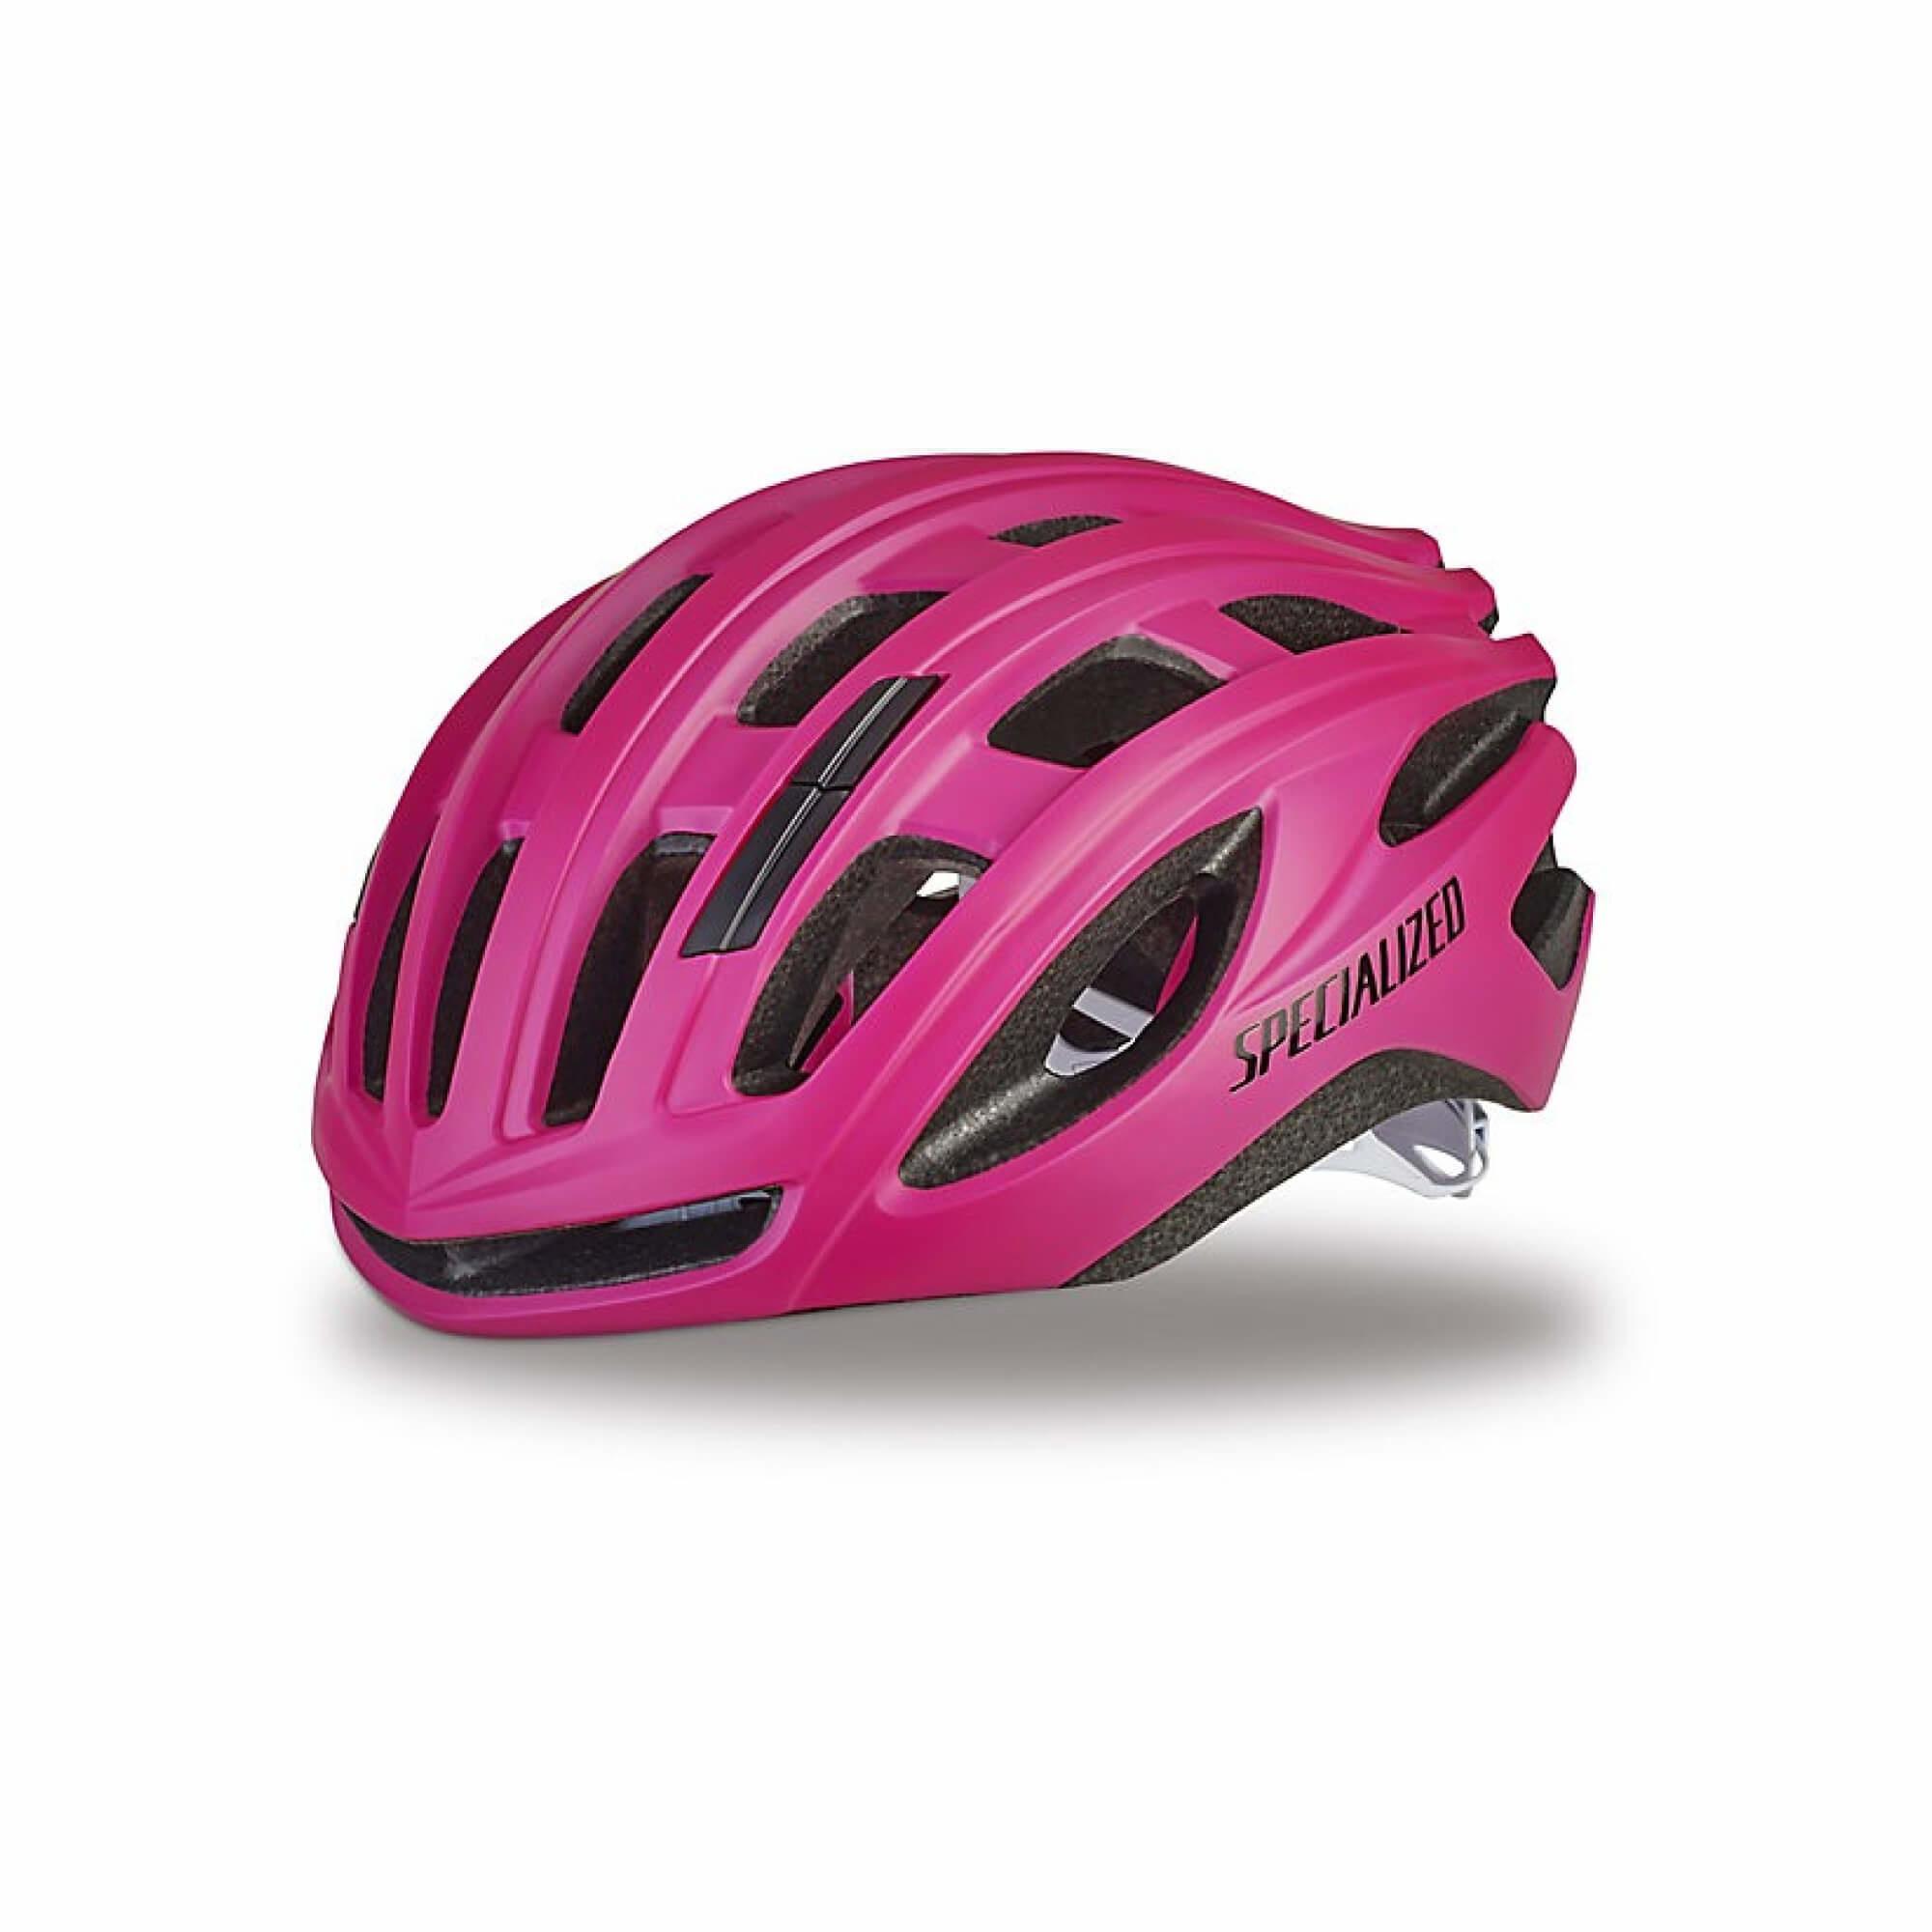 Propero 2 Helmet Aus Wmn High Vis Pink Large 2017-1